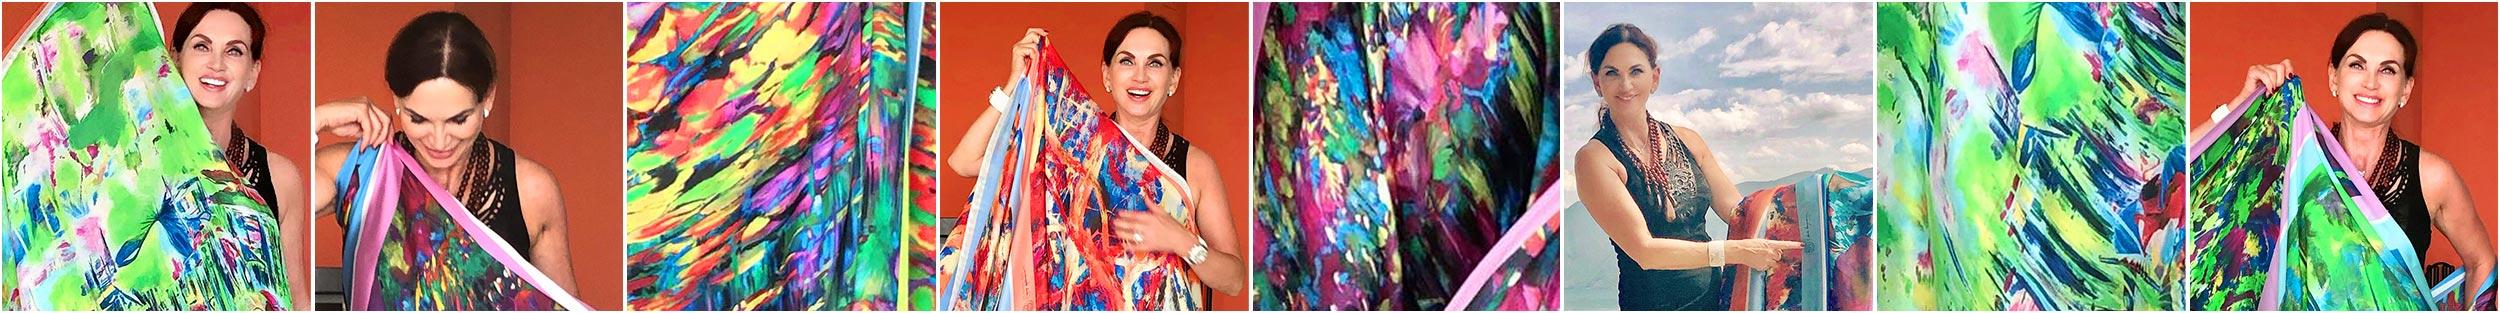 Contemporary Artist Cornelia Hagmann La Galleria Silk Scarves Portfolio, Seidenschal, sciarpa di seta, foulard soie,